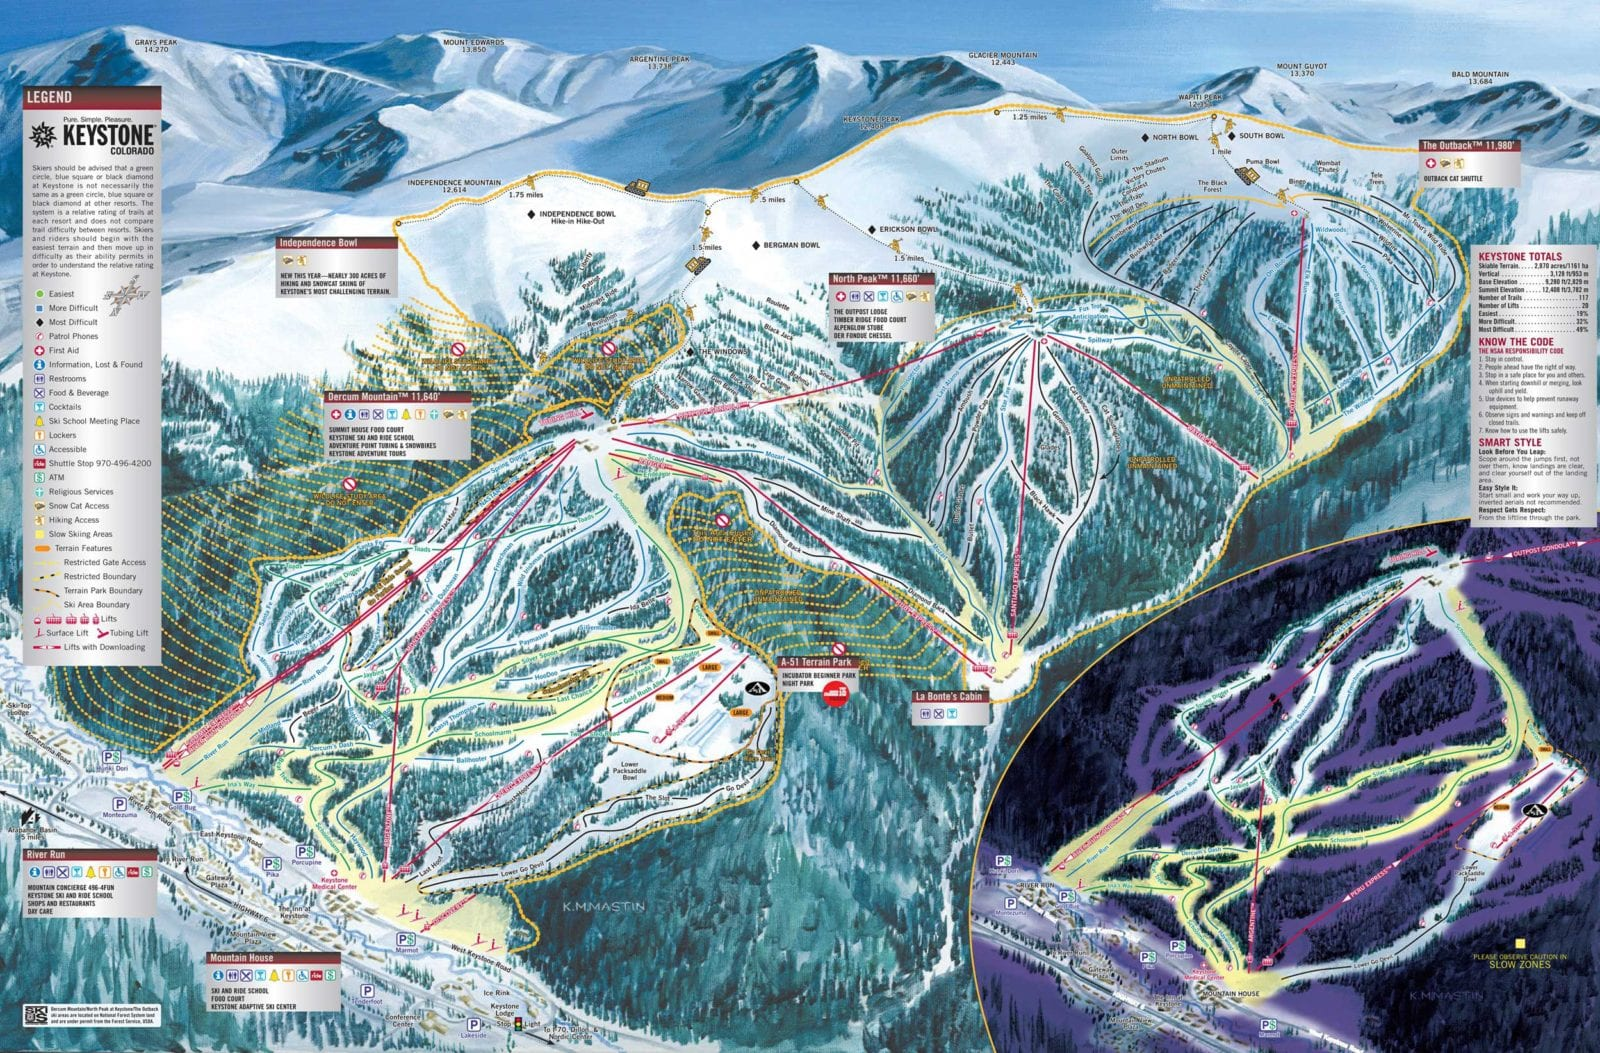 Keystone Ski Resort Colorado Ski Areas - Map of us ski resorts